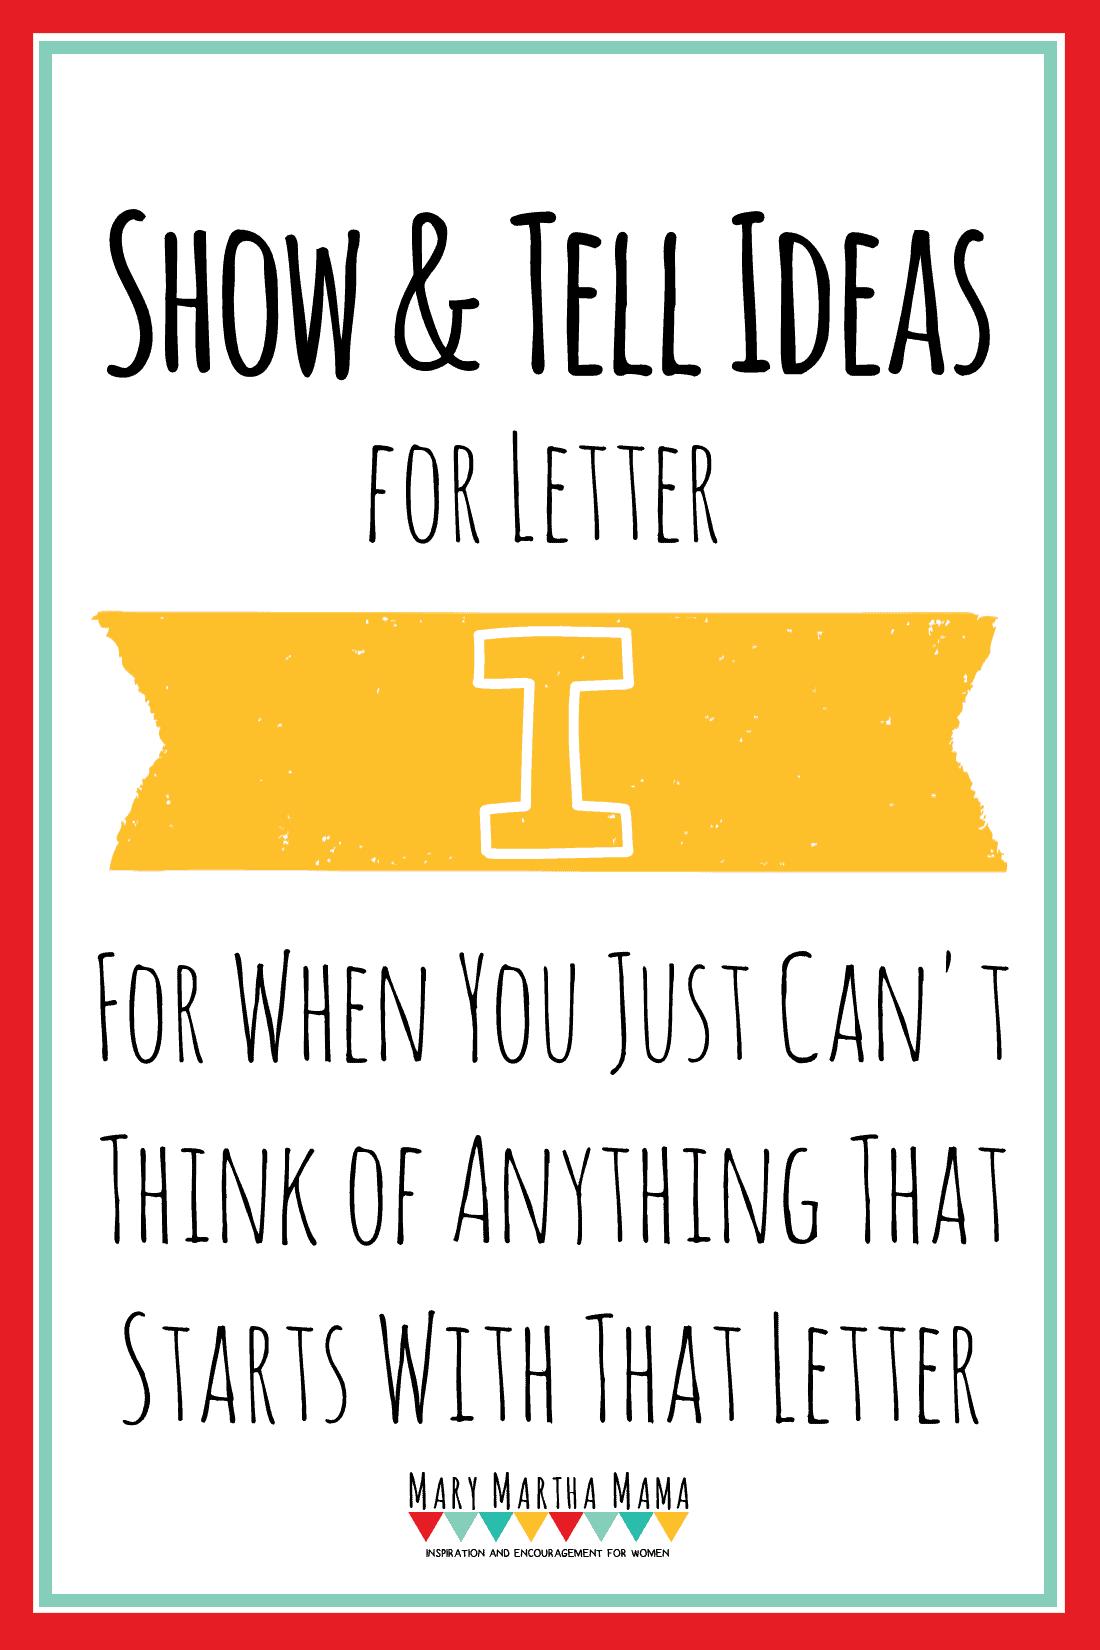 Show and Tell Letter I [15 Ideas!] – Mary Martha Mama